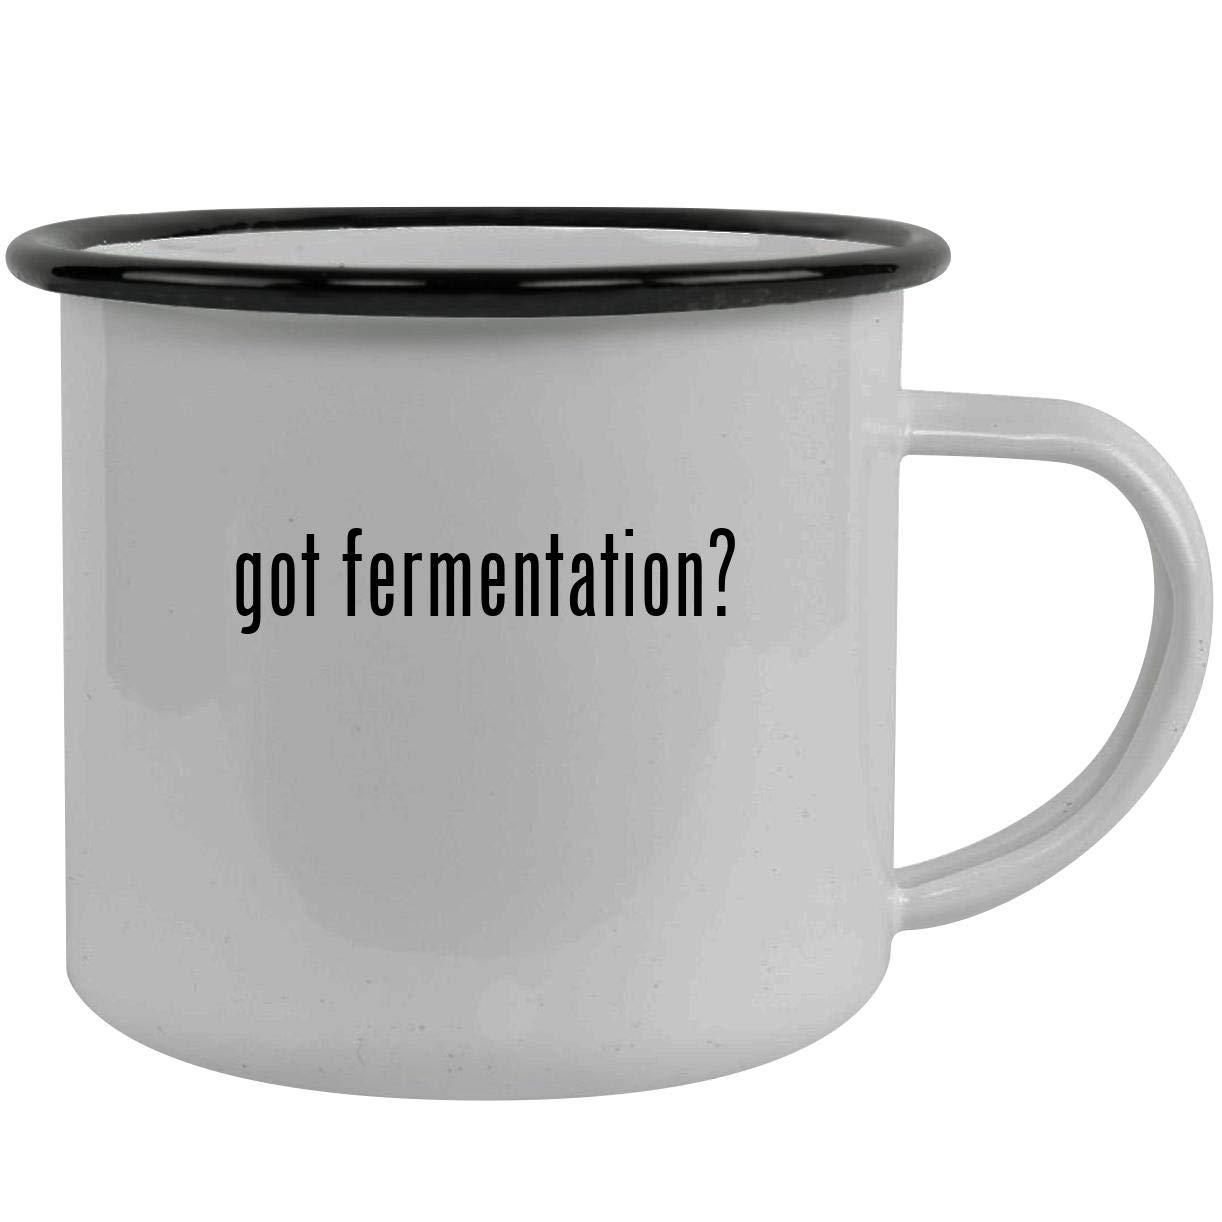 got fermentation? - Stainless Steel 12oz Camping Mug, Black